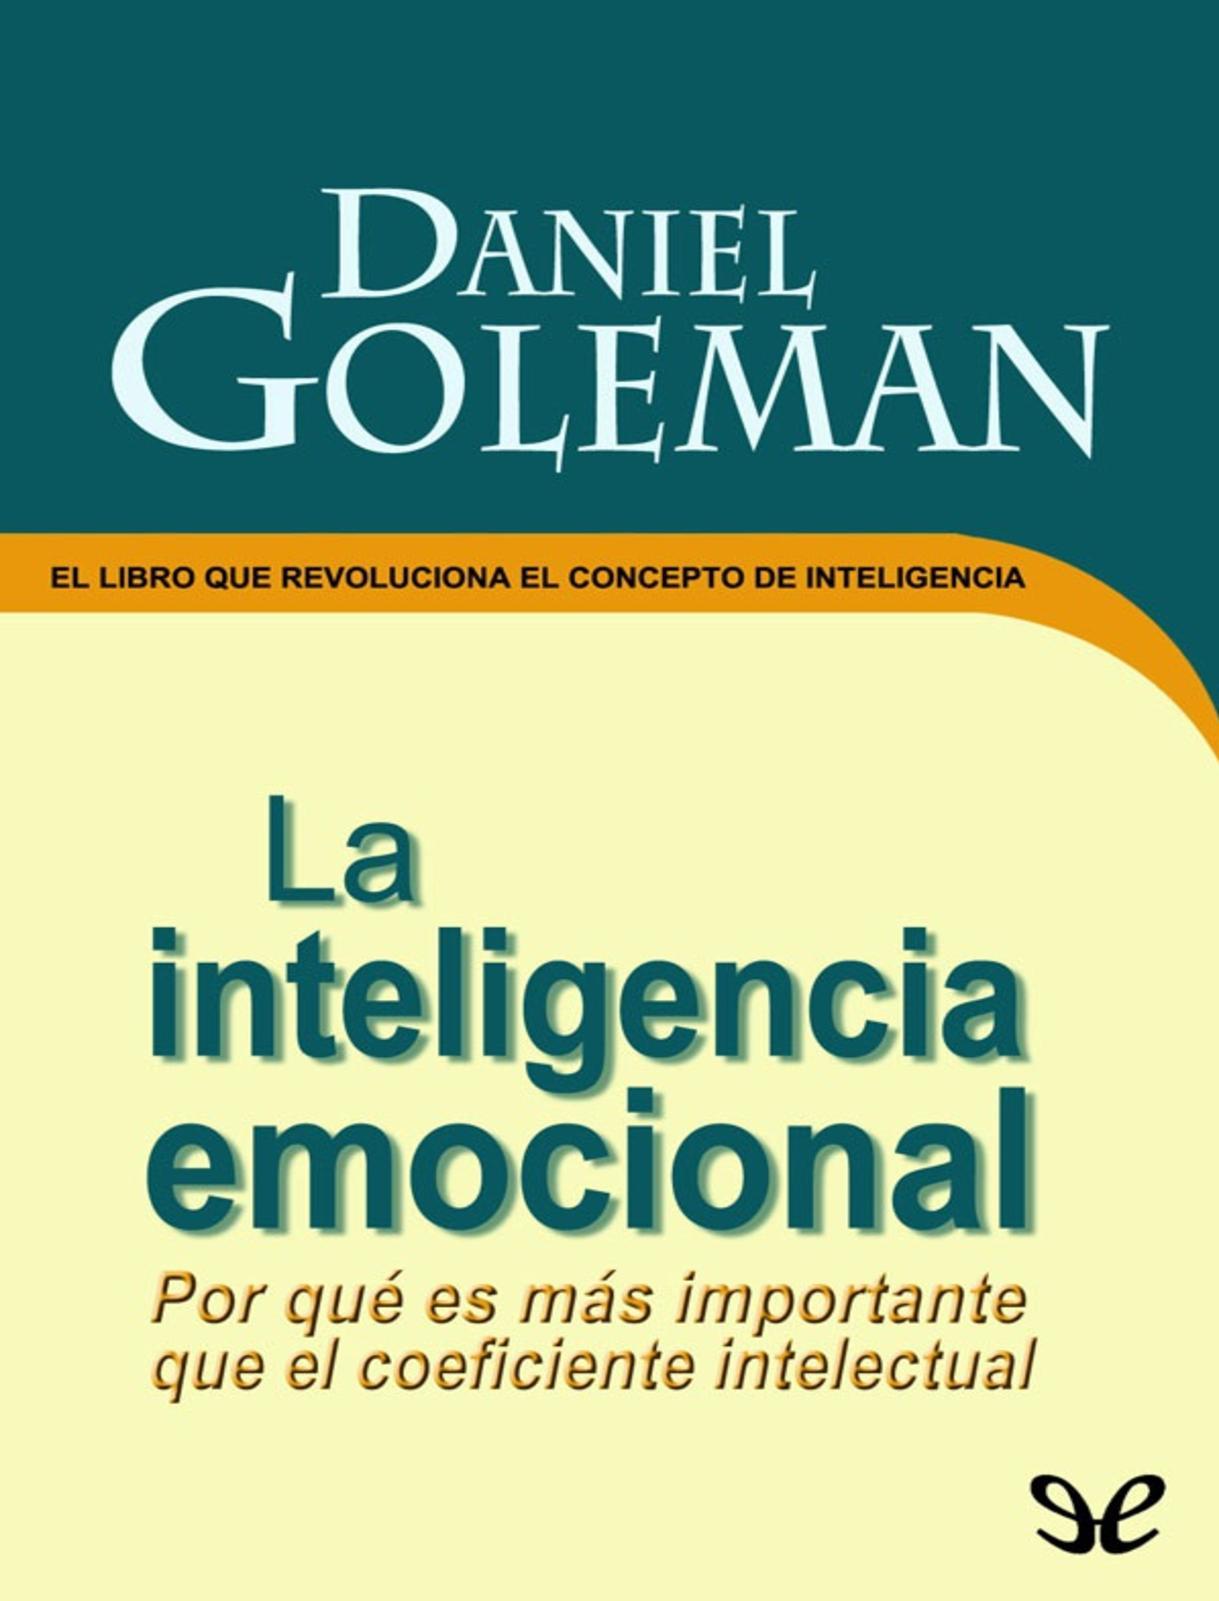 Calaméo - La Inteligencia Emocional Daniel Goleman